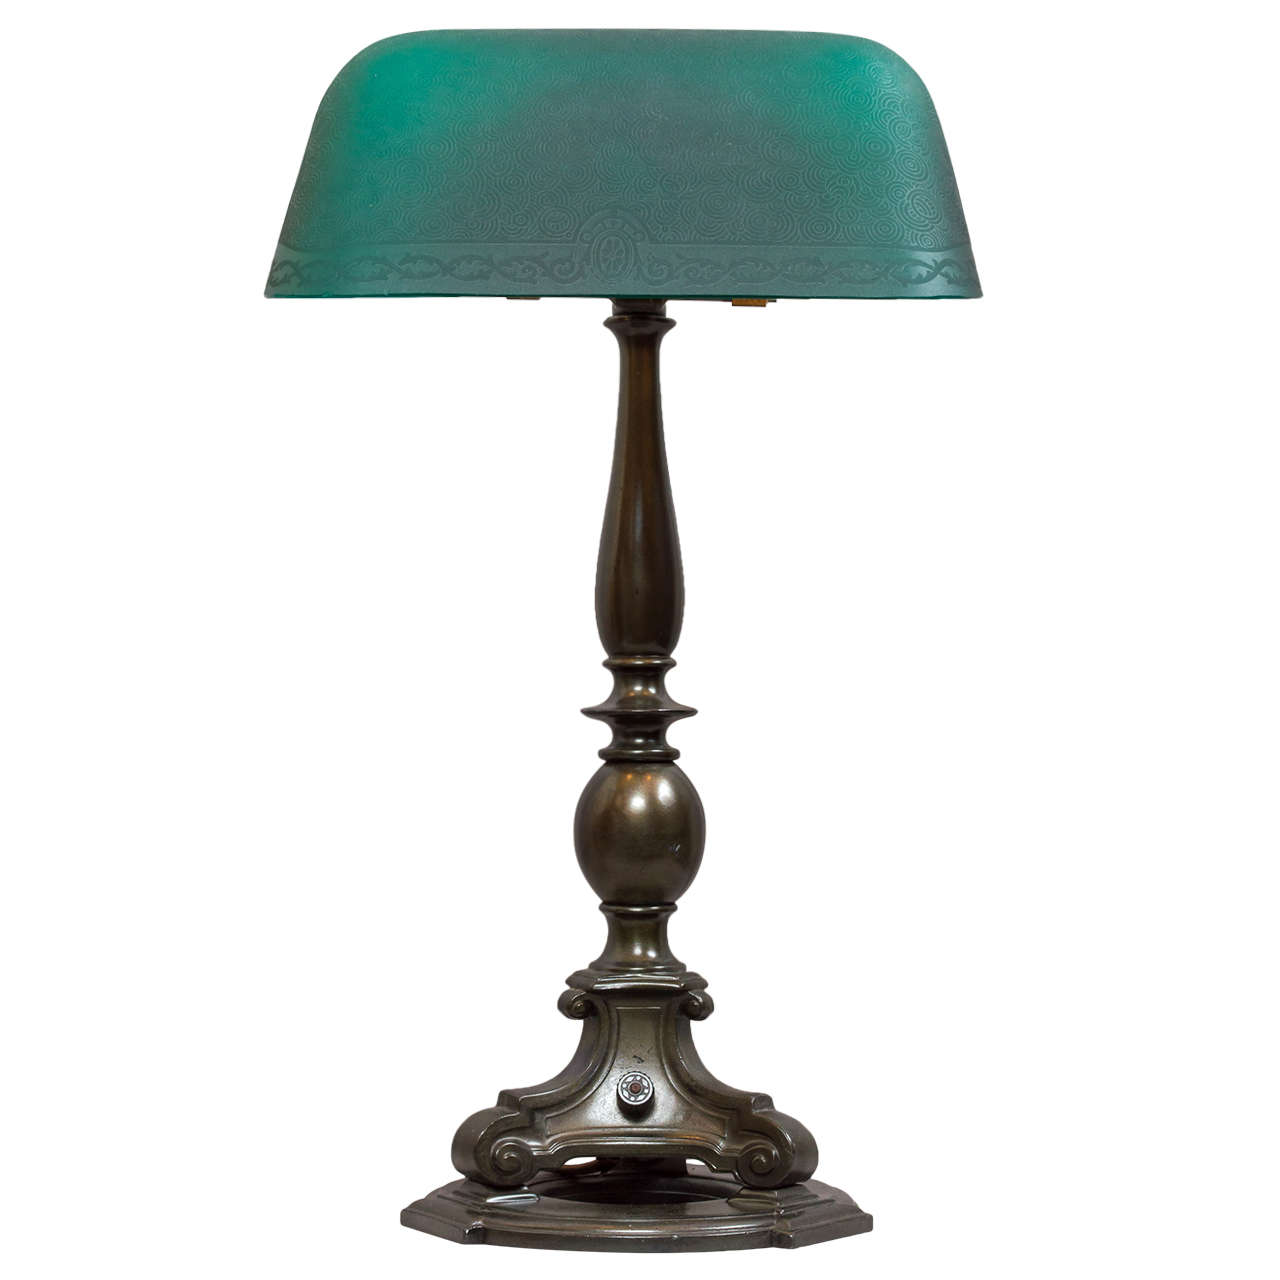 Emeralite Banker\u0027s Style Desk Lamp at 1stdibs